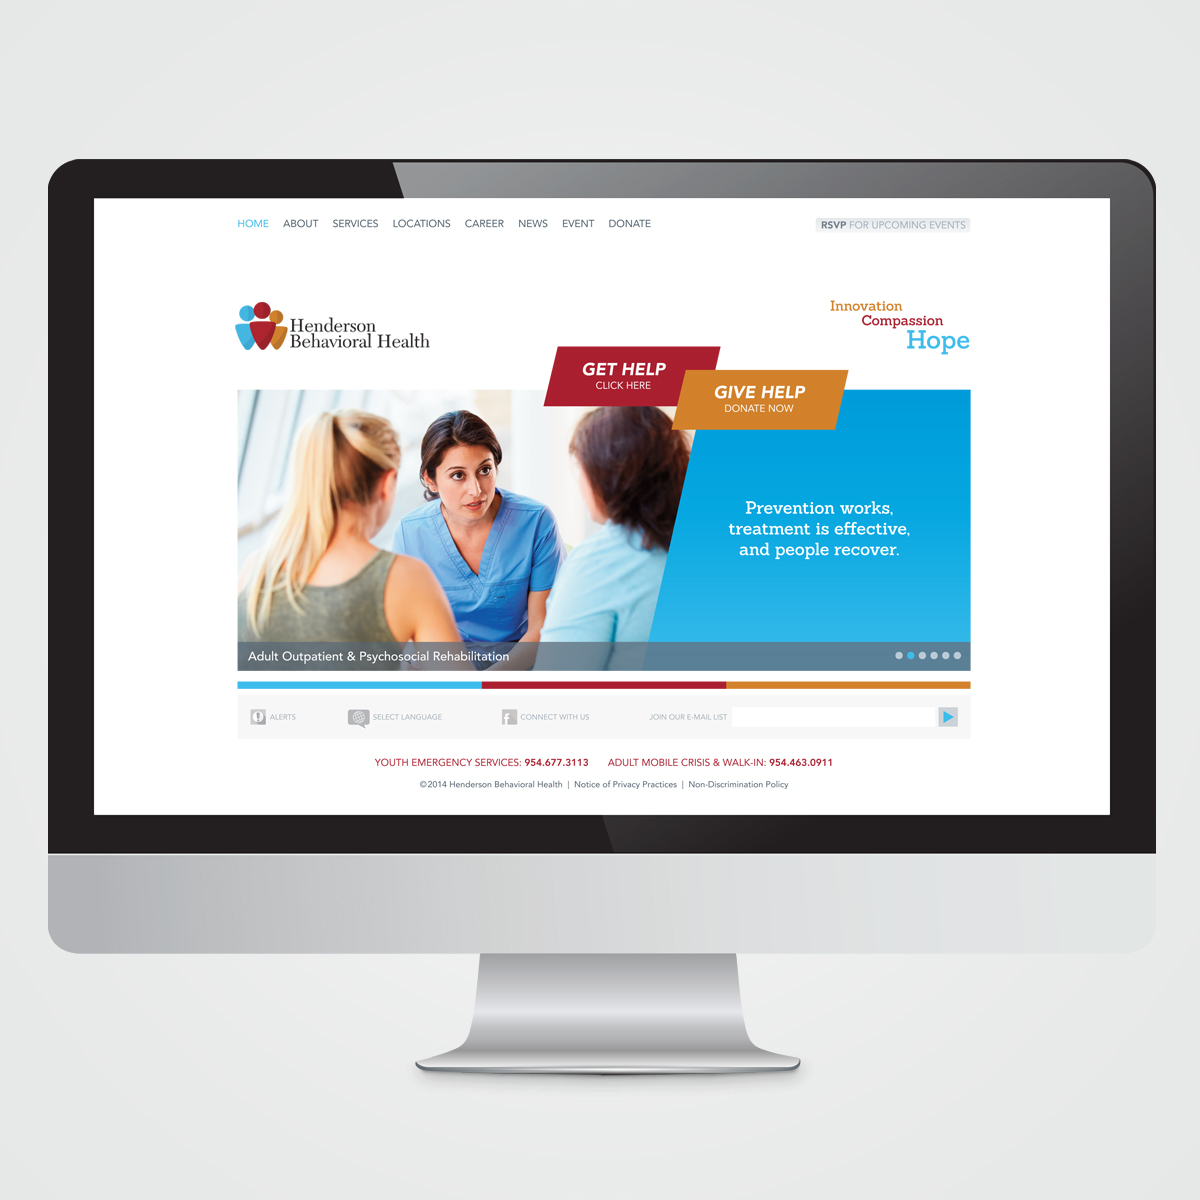 Website design for Henderson Behavioral Health, the largest behavioral health organization in South Florida